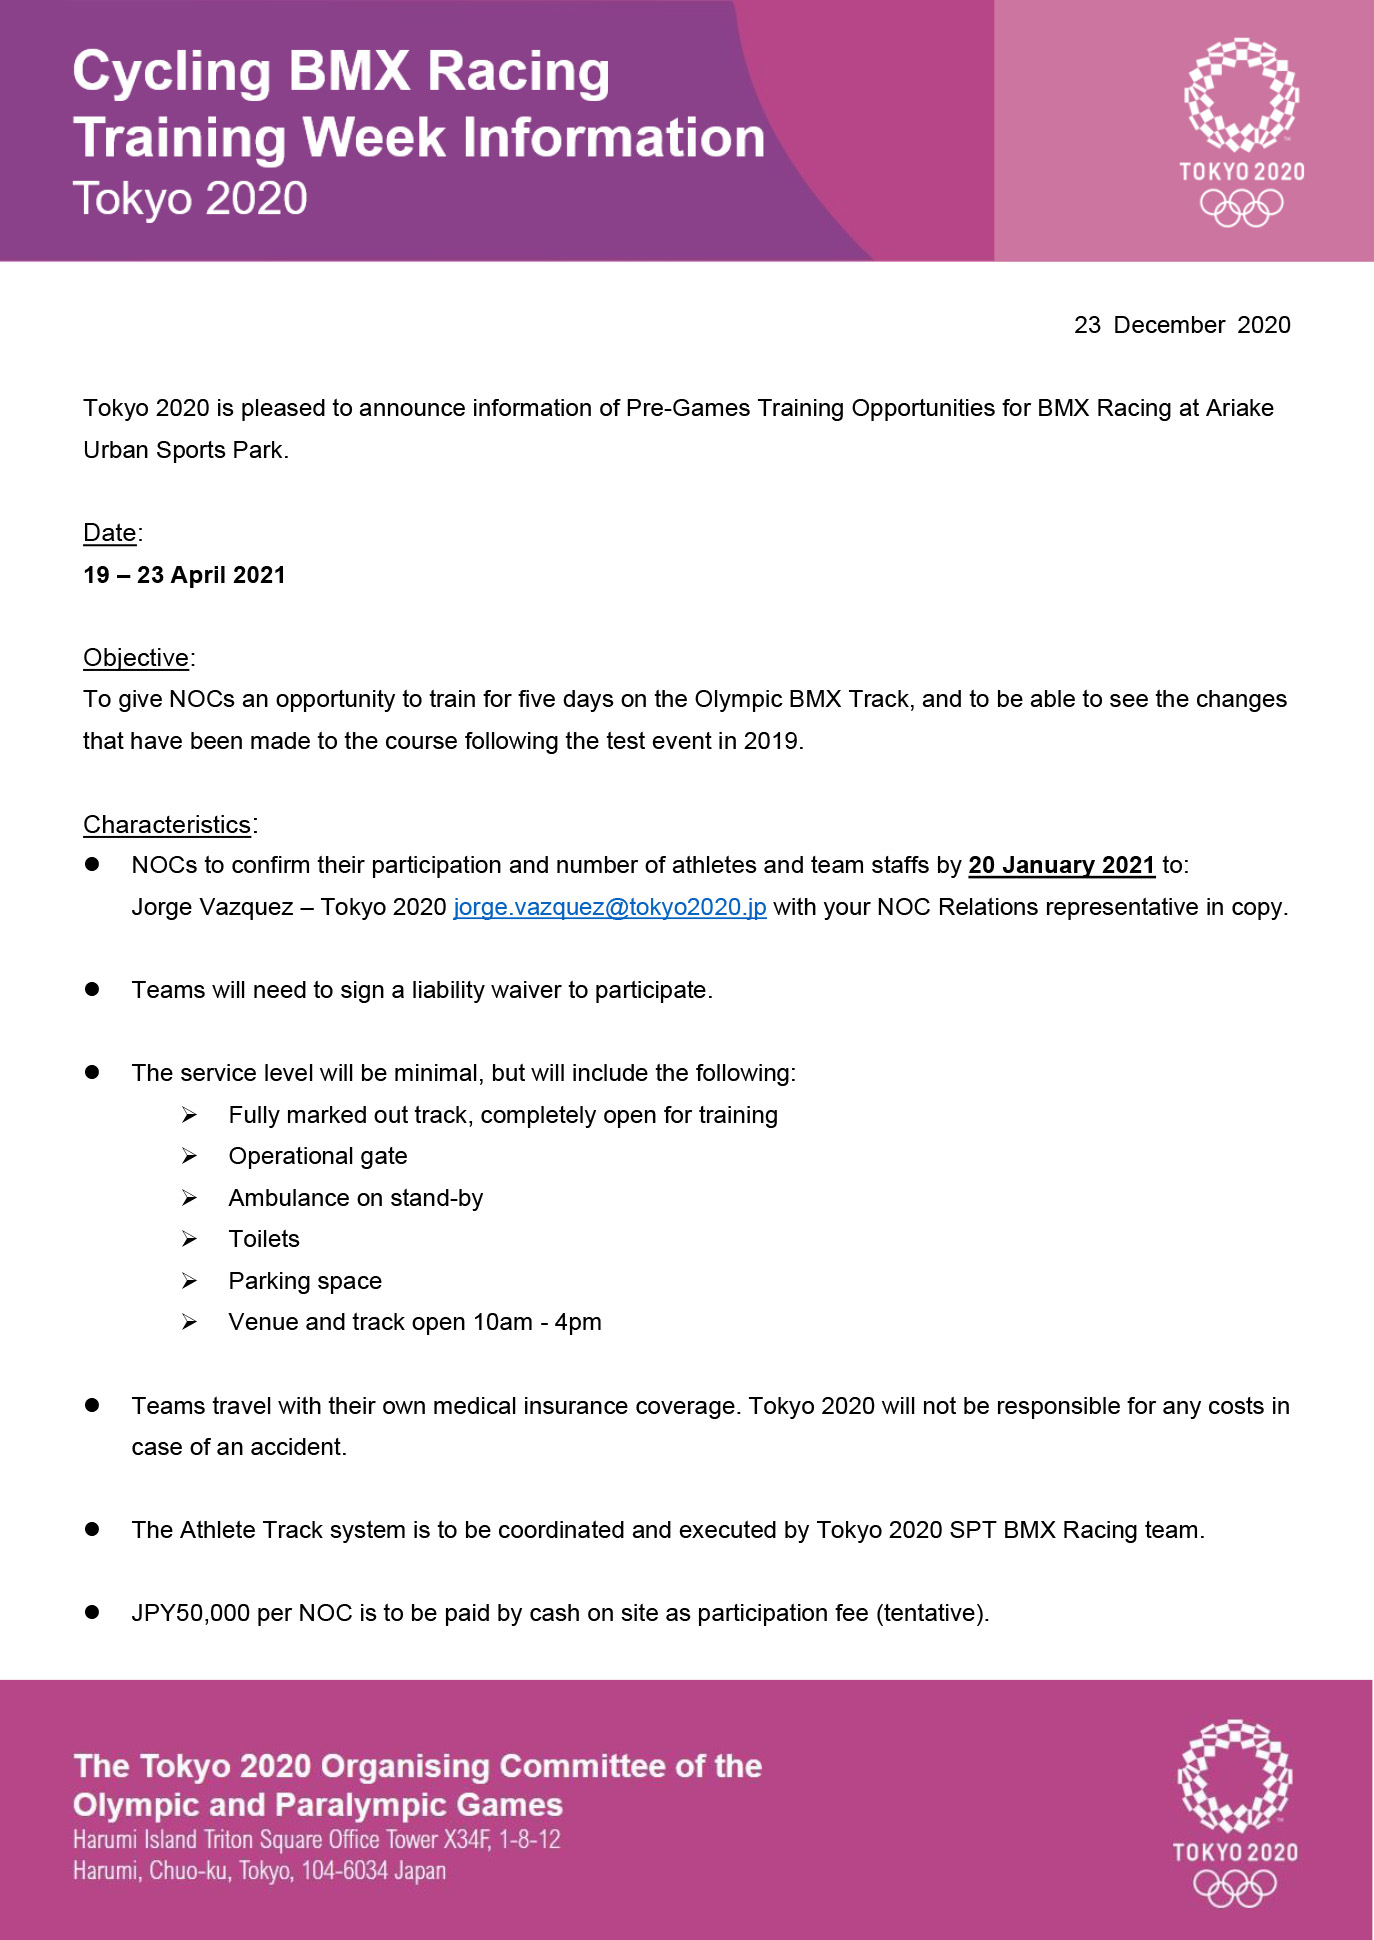 Tokyo 2020 - Cycling BMX Racing Traning Week Information as of 23 December 2020 P1